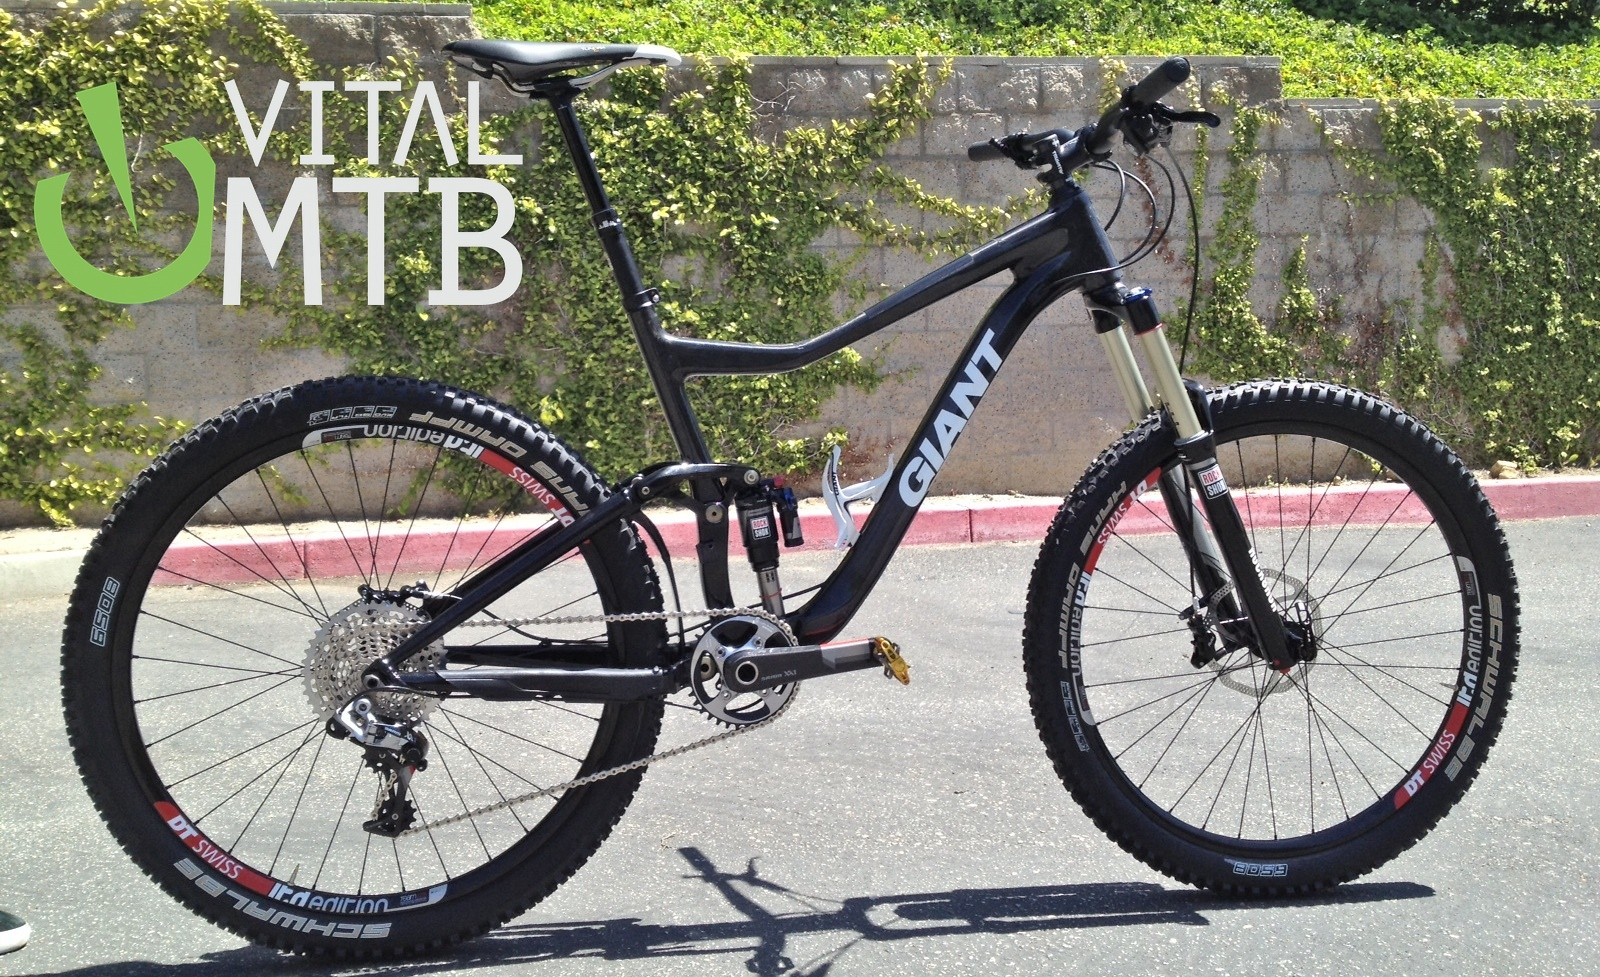 Prototype Giant 650b Carbon Trail Bike! - sspomer - Mountain Biking Pictures - Vital MTB